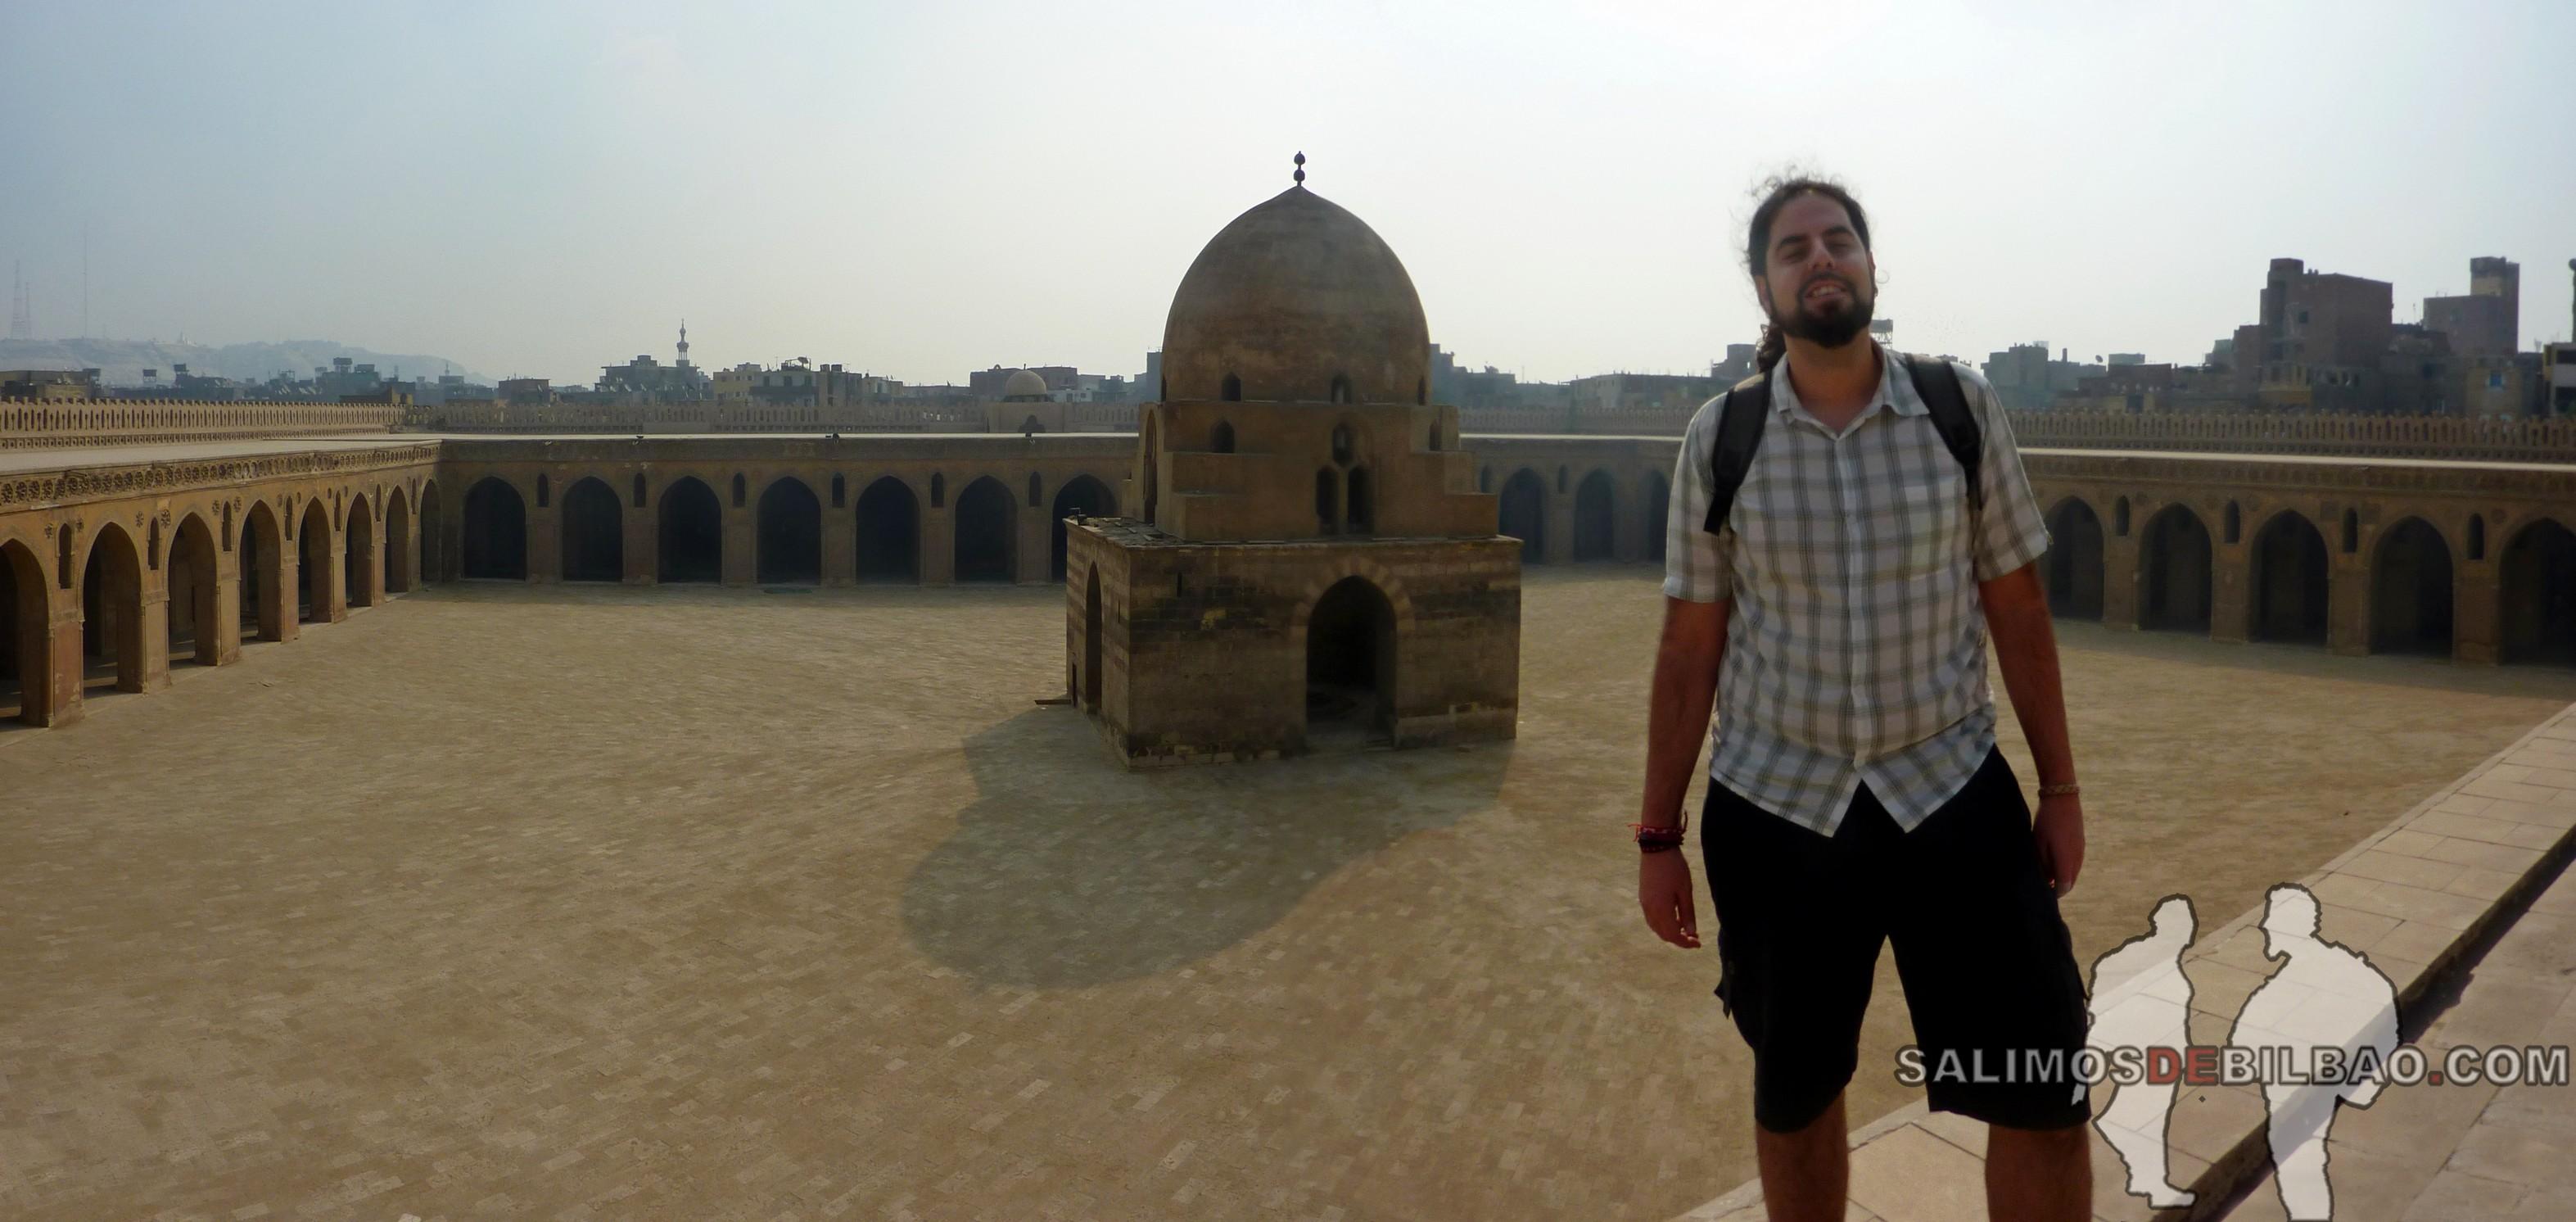 0017. Katz, Pano, Mezquita de Ahmad Ibn Tulun, Cairo